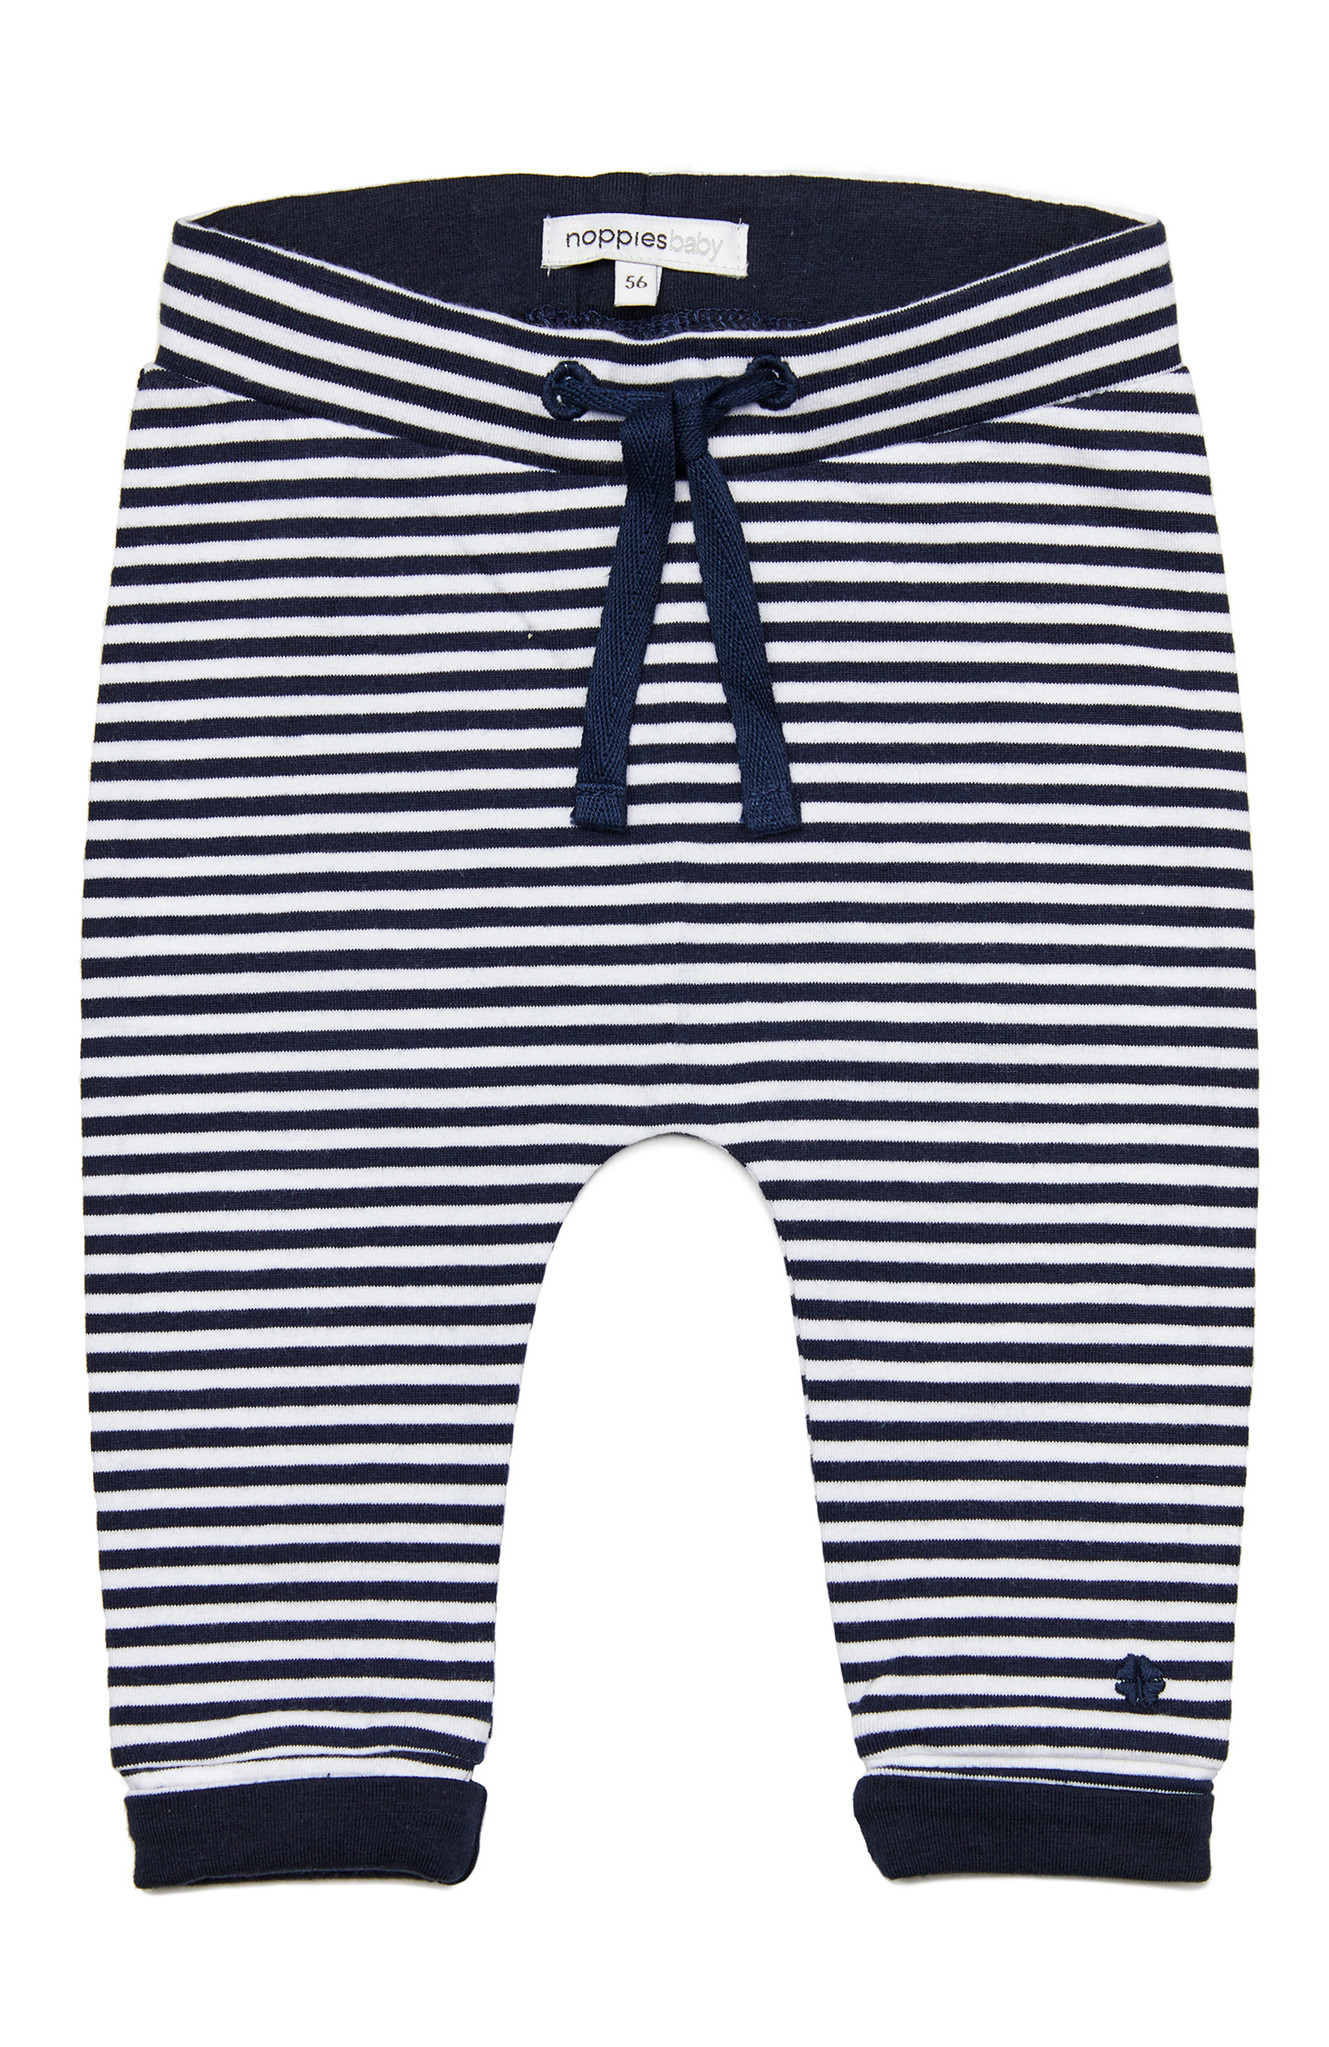 noppies 67374 Pants Nola navy